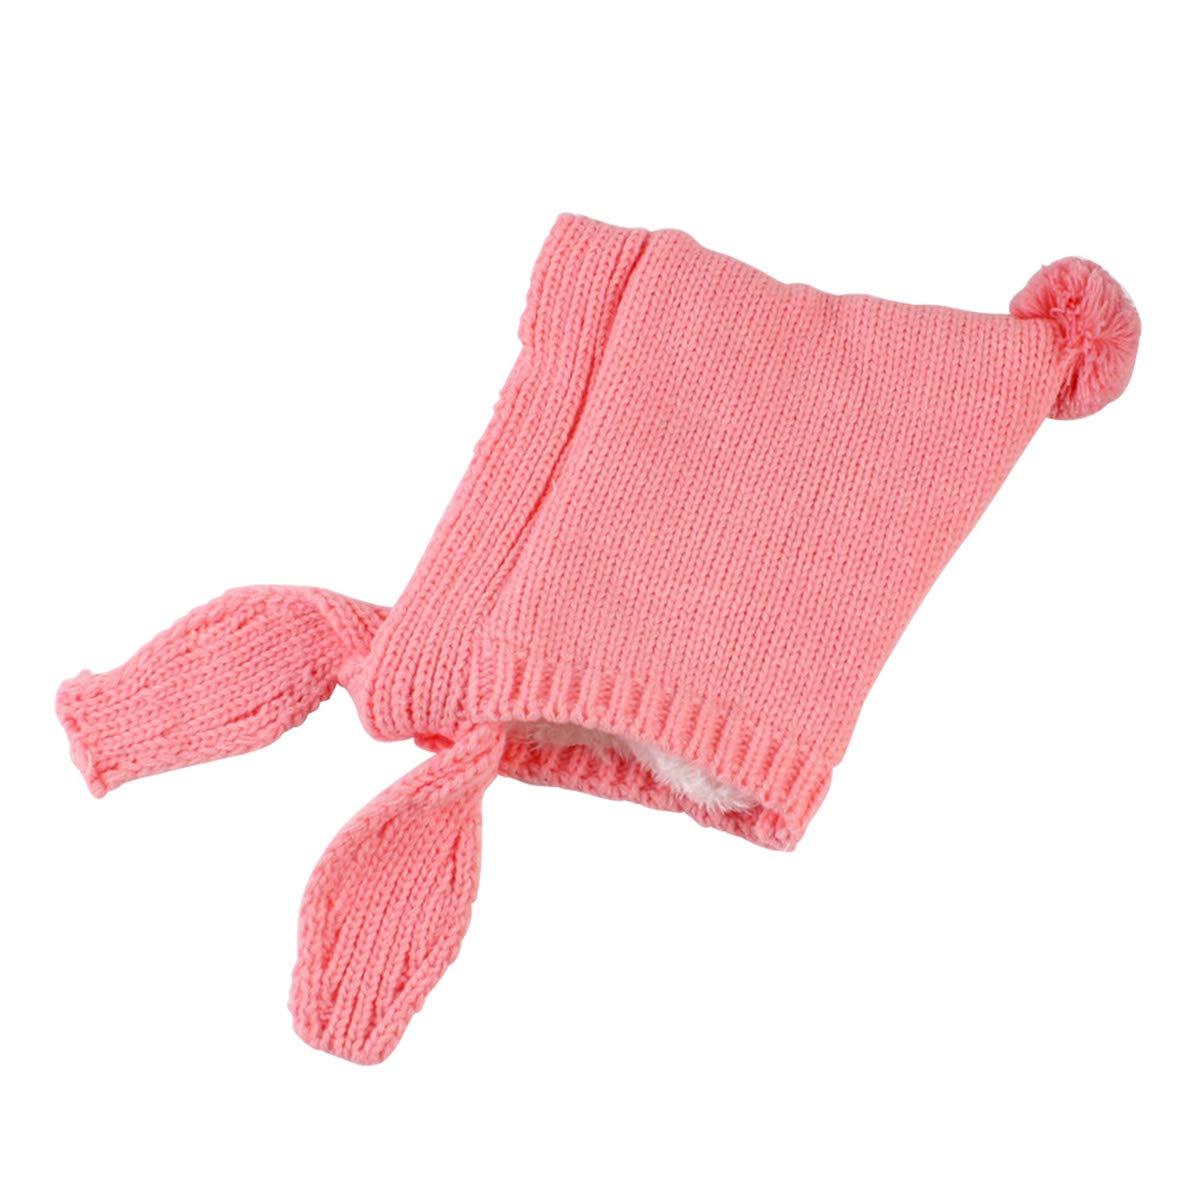 Pink Baby Hats Infant Boys Girls Winter Earflap Knit Warm Spire Cap Hat with Pom Pom